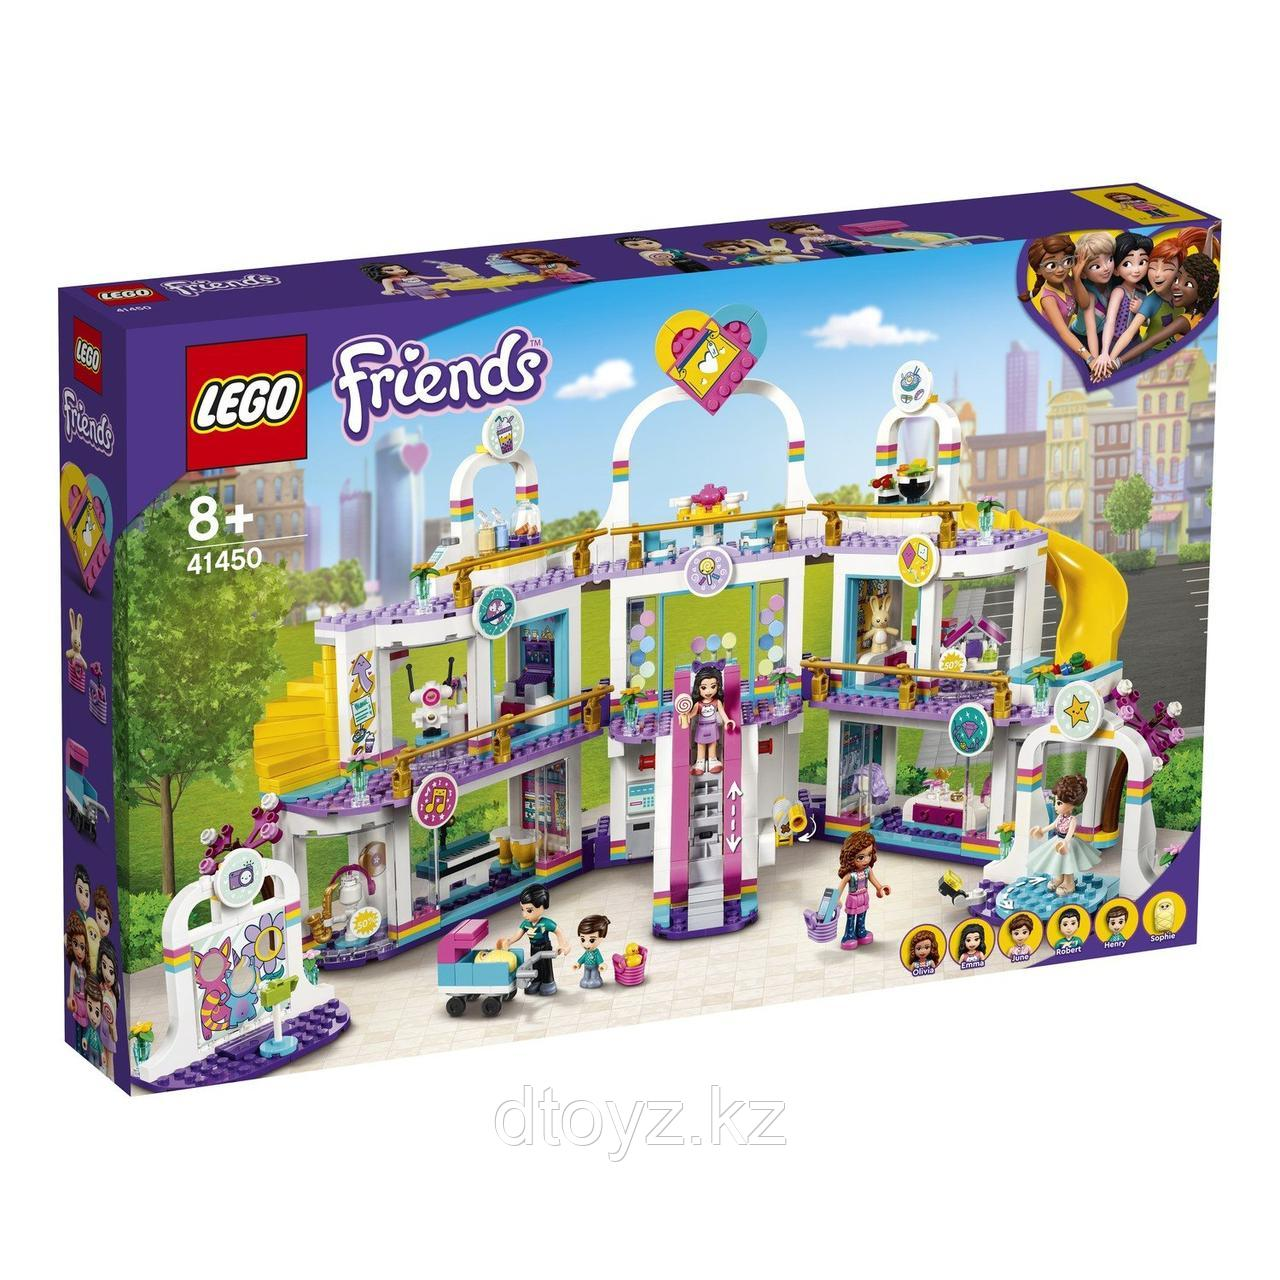 Lego Friends Торговый центр Хартлейк Сити 41450